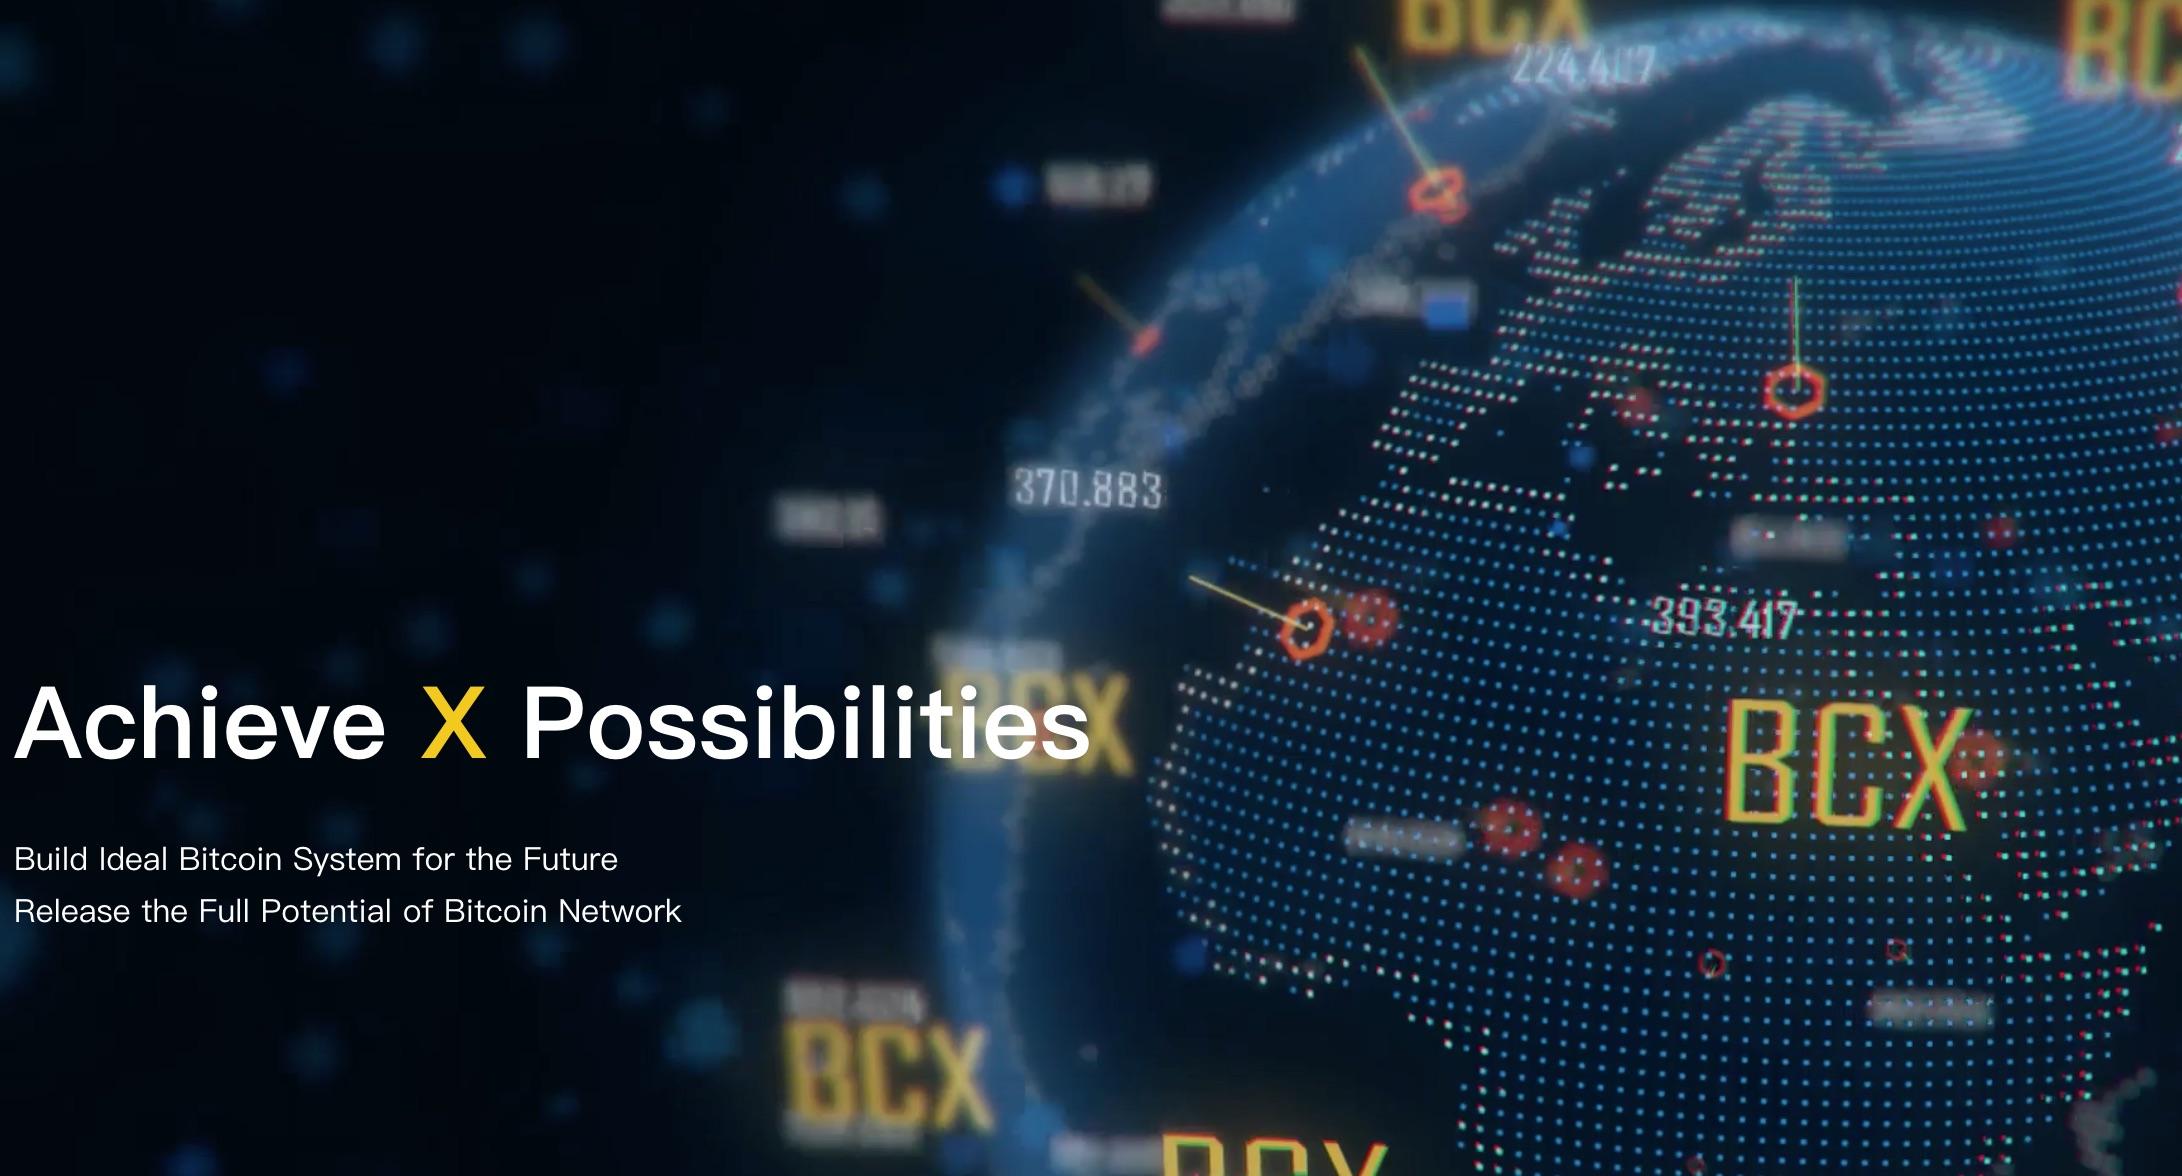 BCX The True Bitcoin for the Future